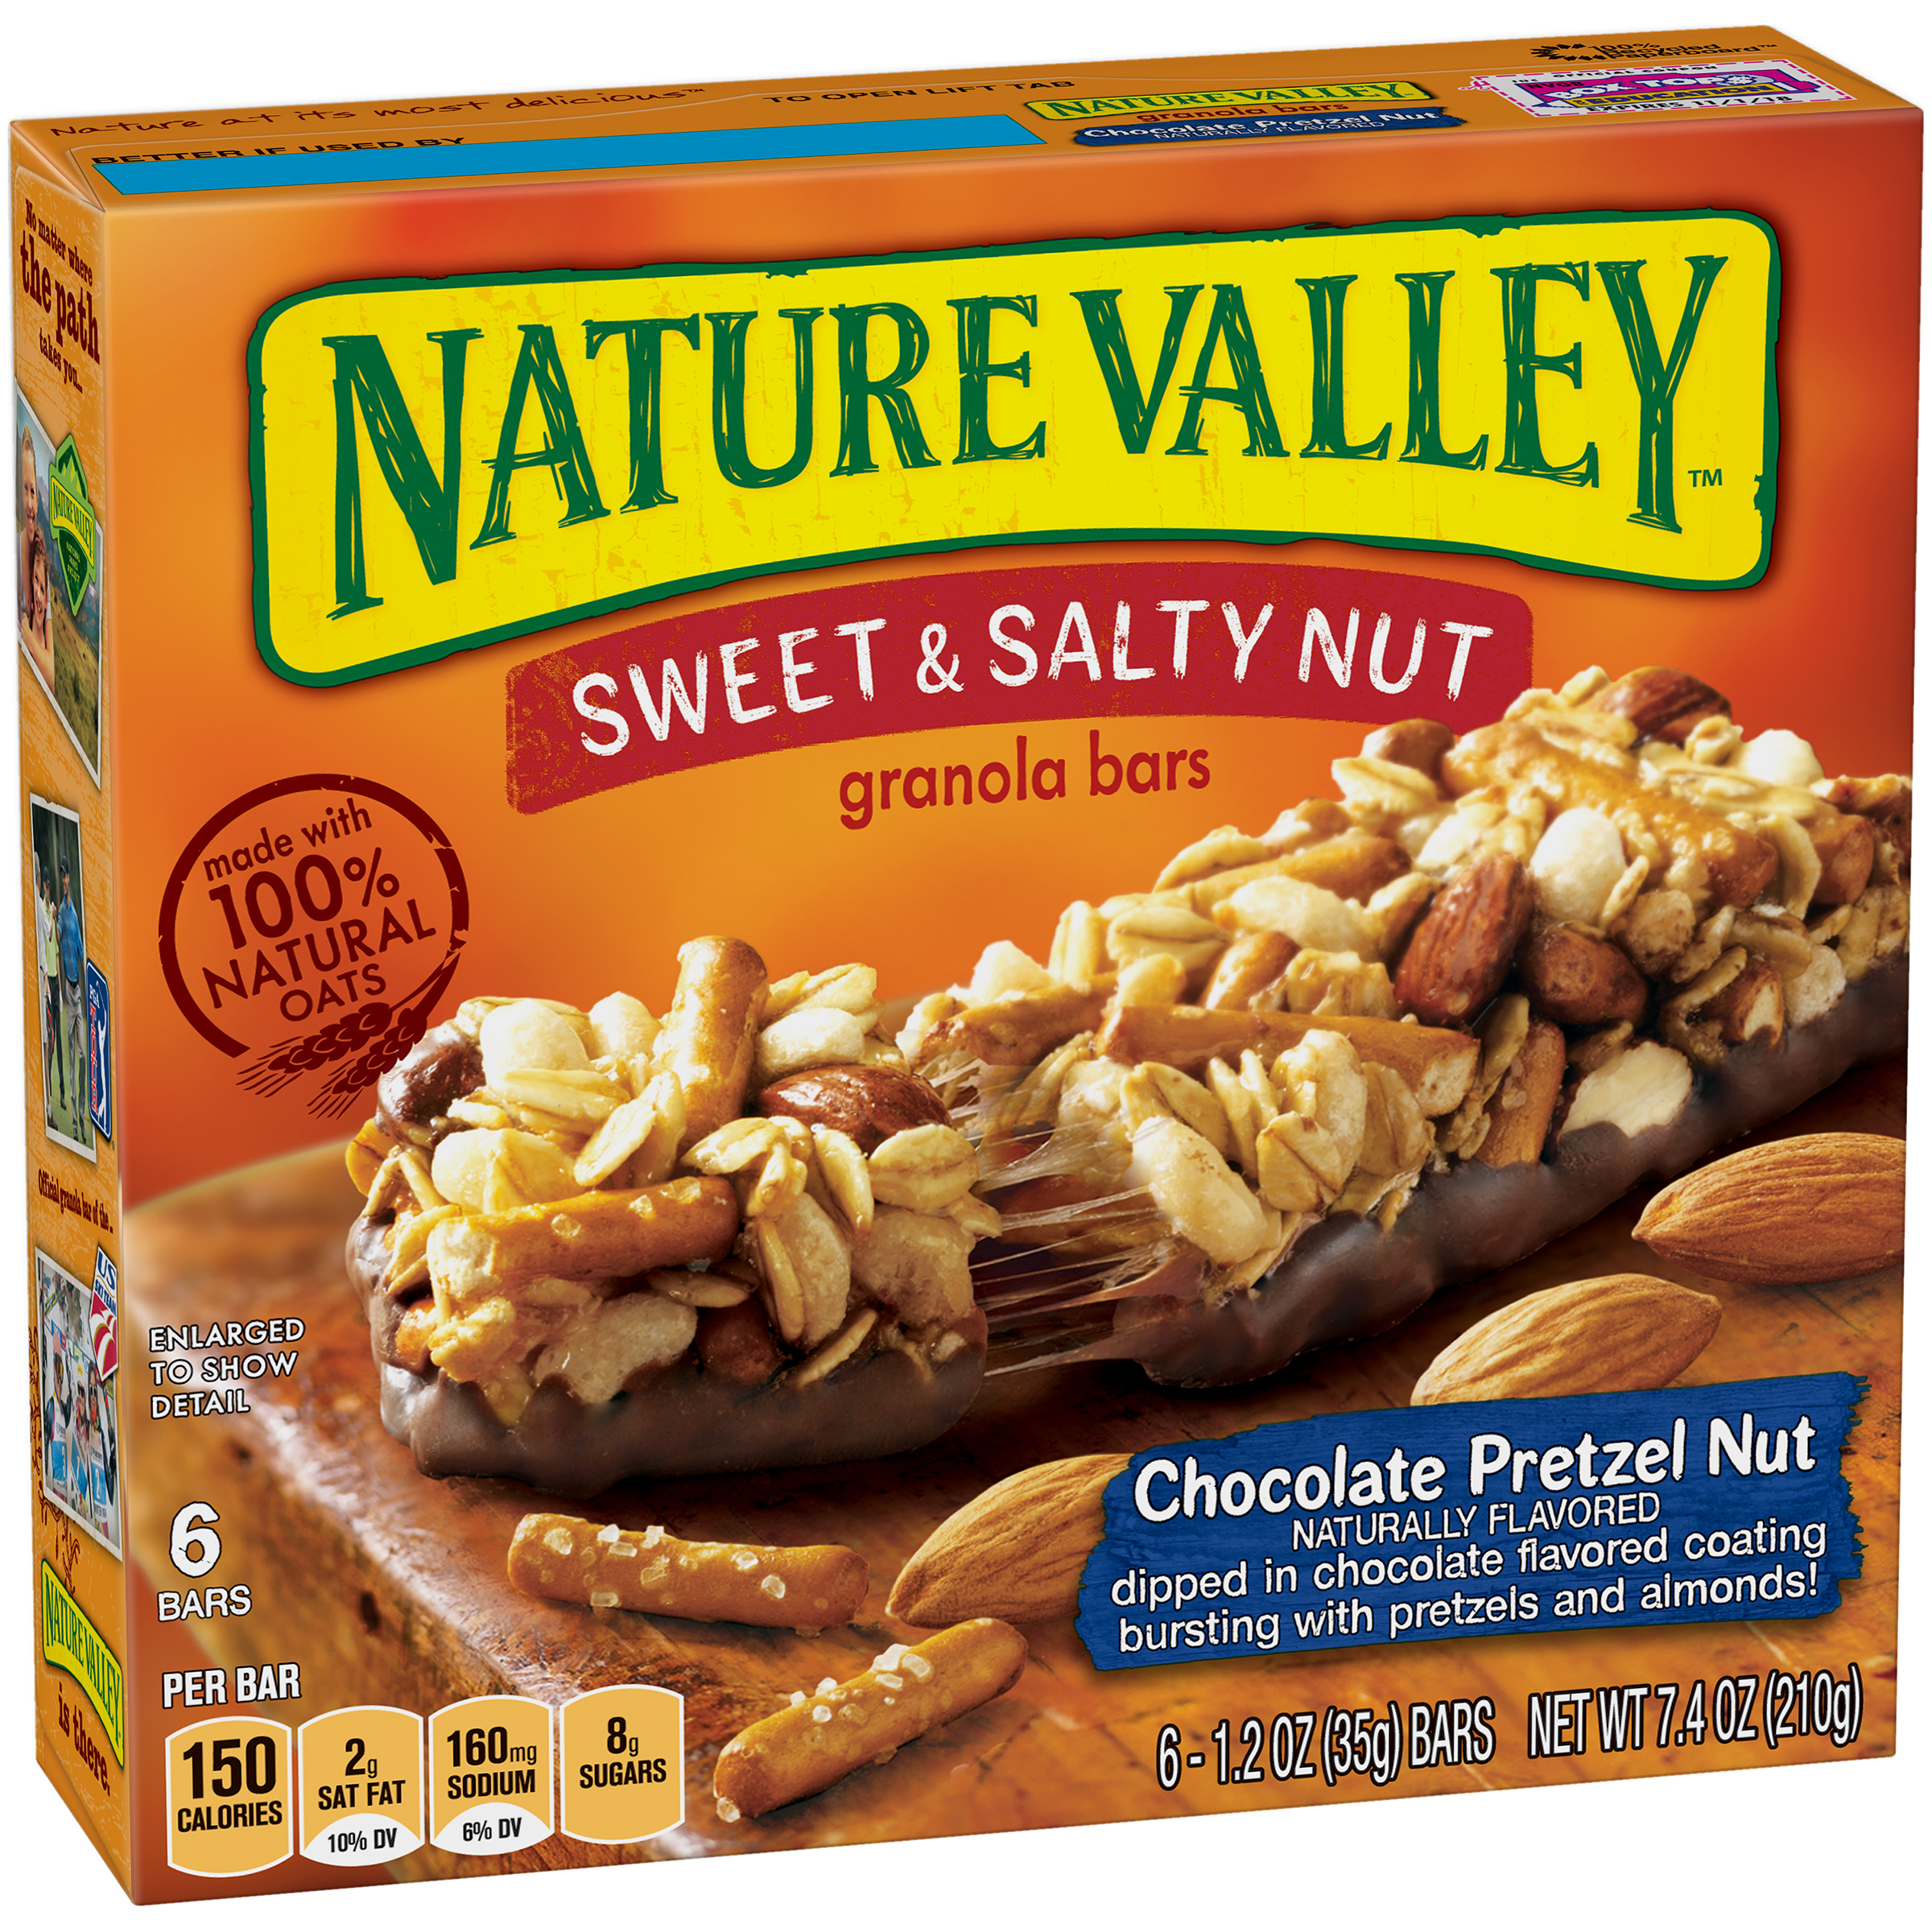 Nature Valley��� Chocolate Pretzel Nut Sweet & Salty Nut Granola Bars 6 ct Box